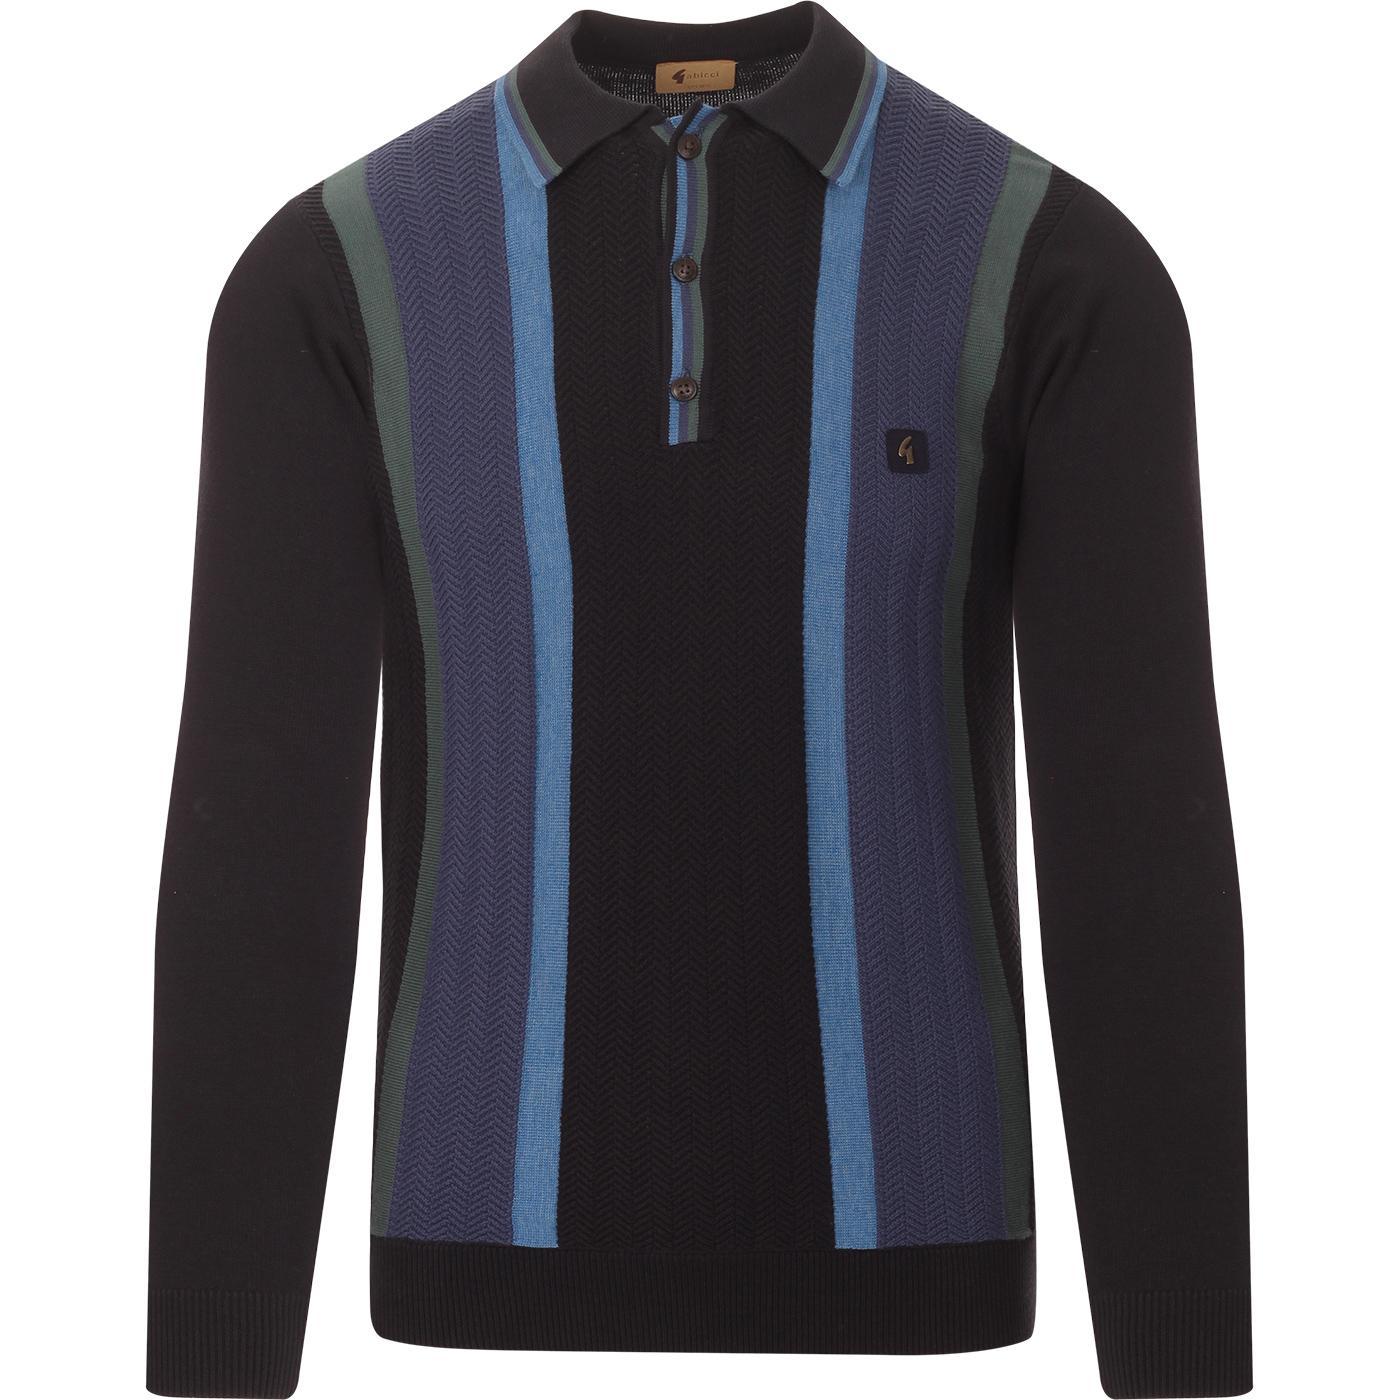 Freeman GABICCI VINTAGE Retro Knitted Polo in Navy